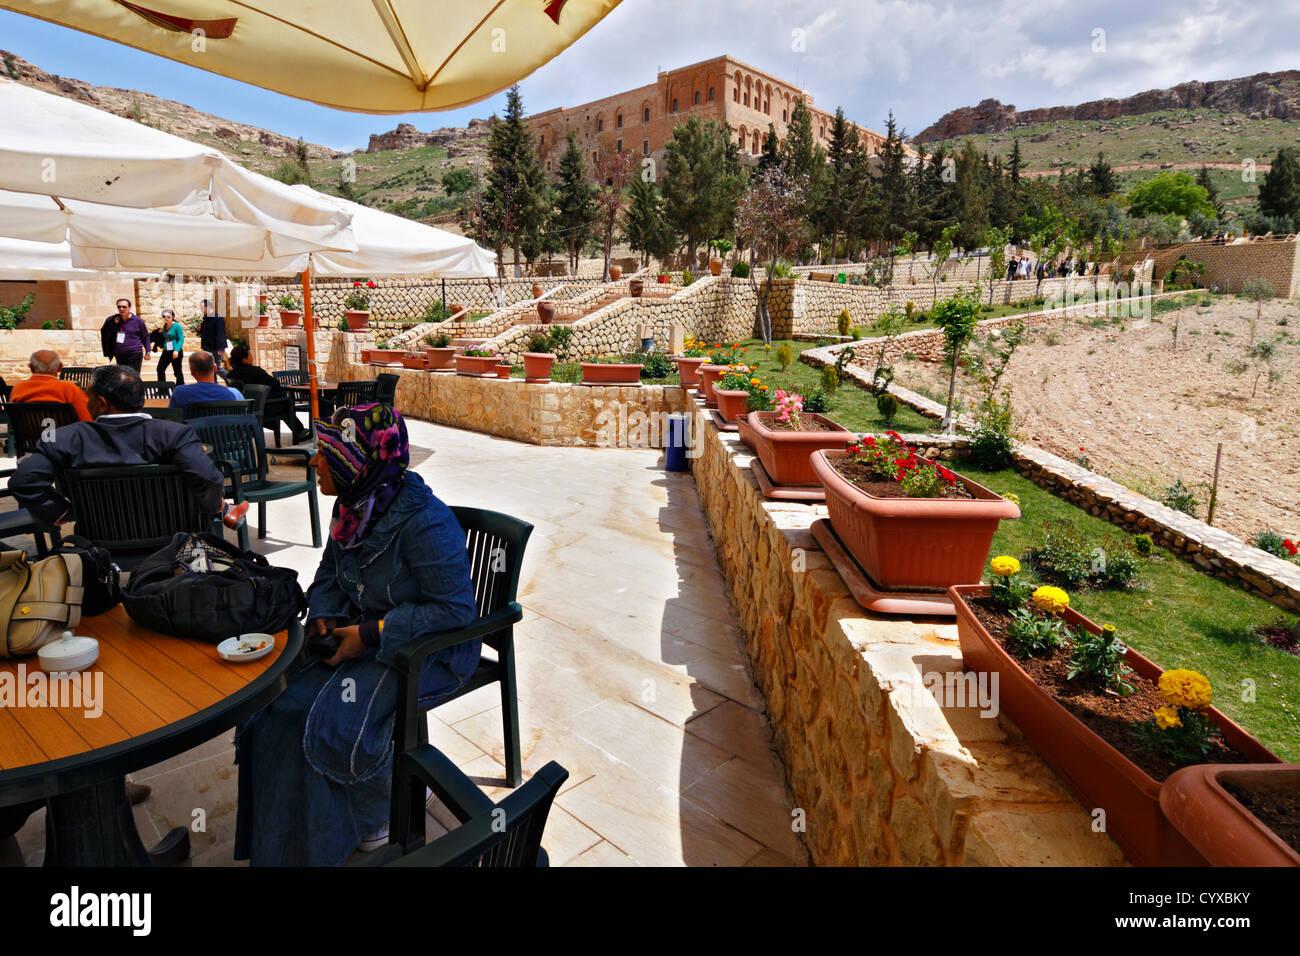 Deyr ul-Zafaran monastery visitors, Eastern Turkey - Stock Image